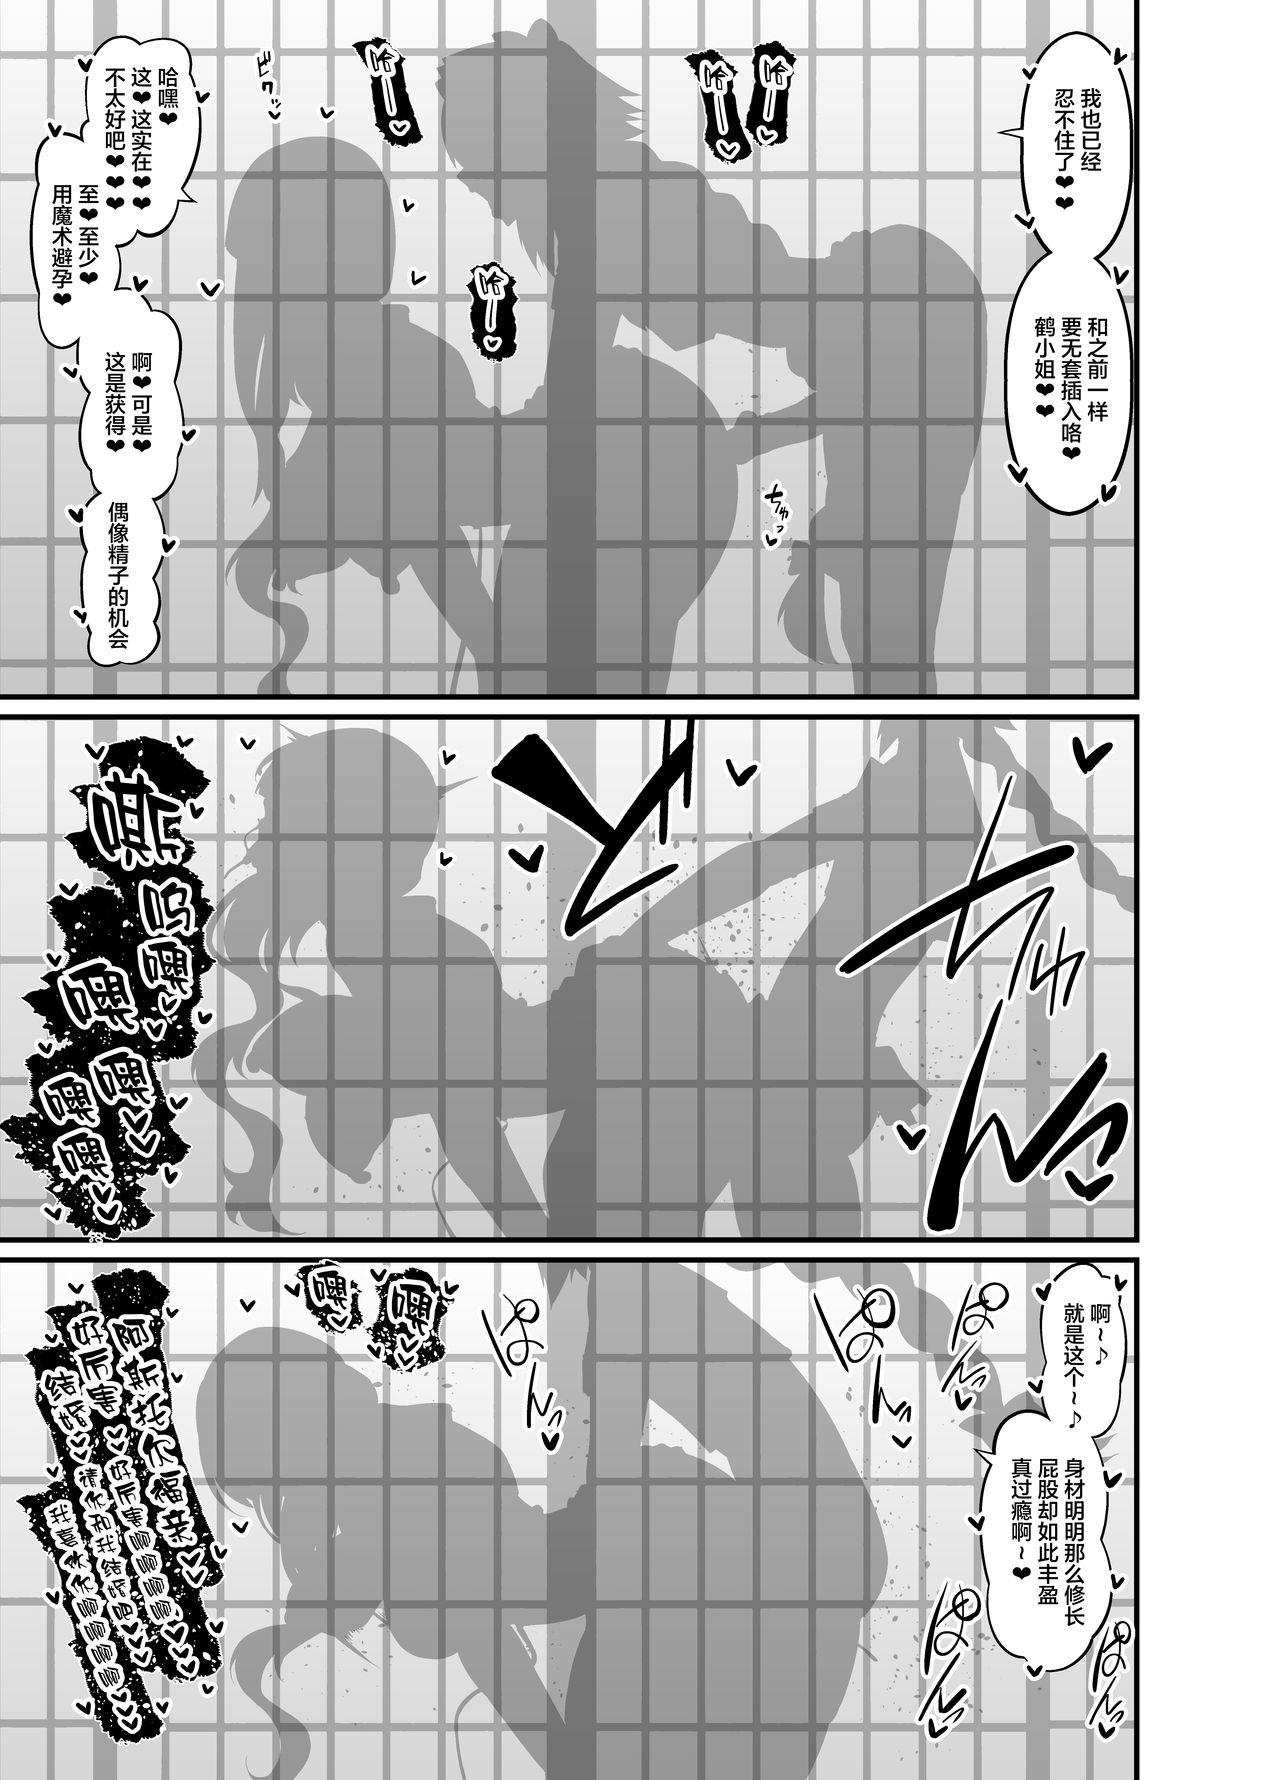 Miss Crane, Astolfo to Nakayoku Naru 2